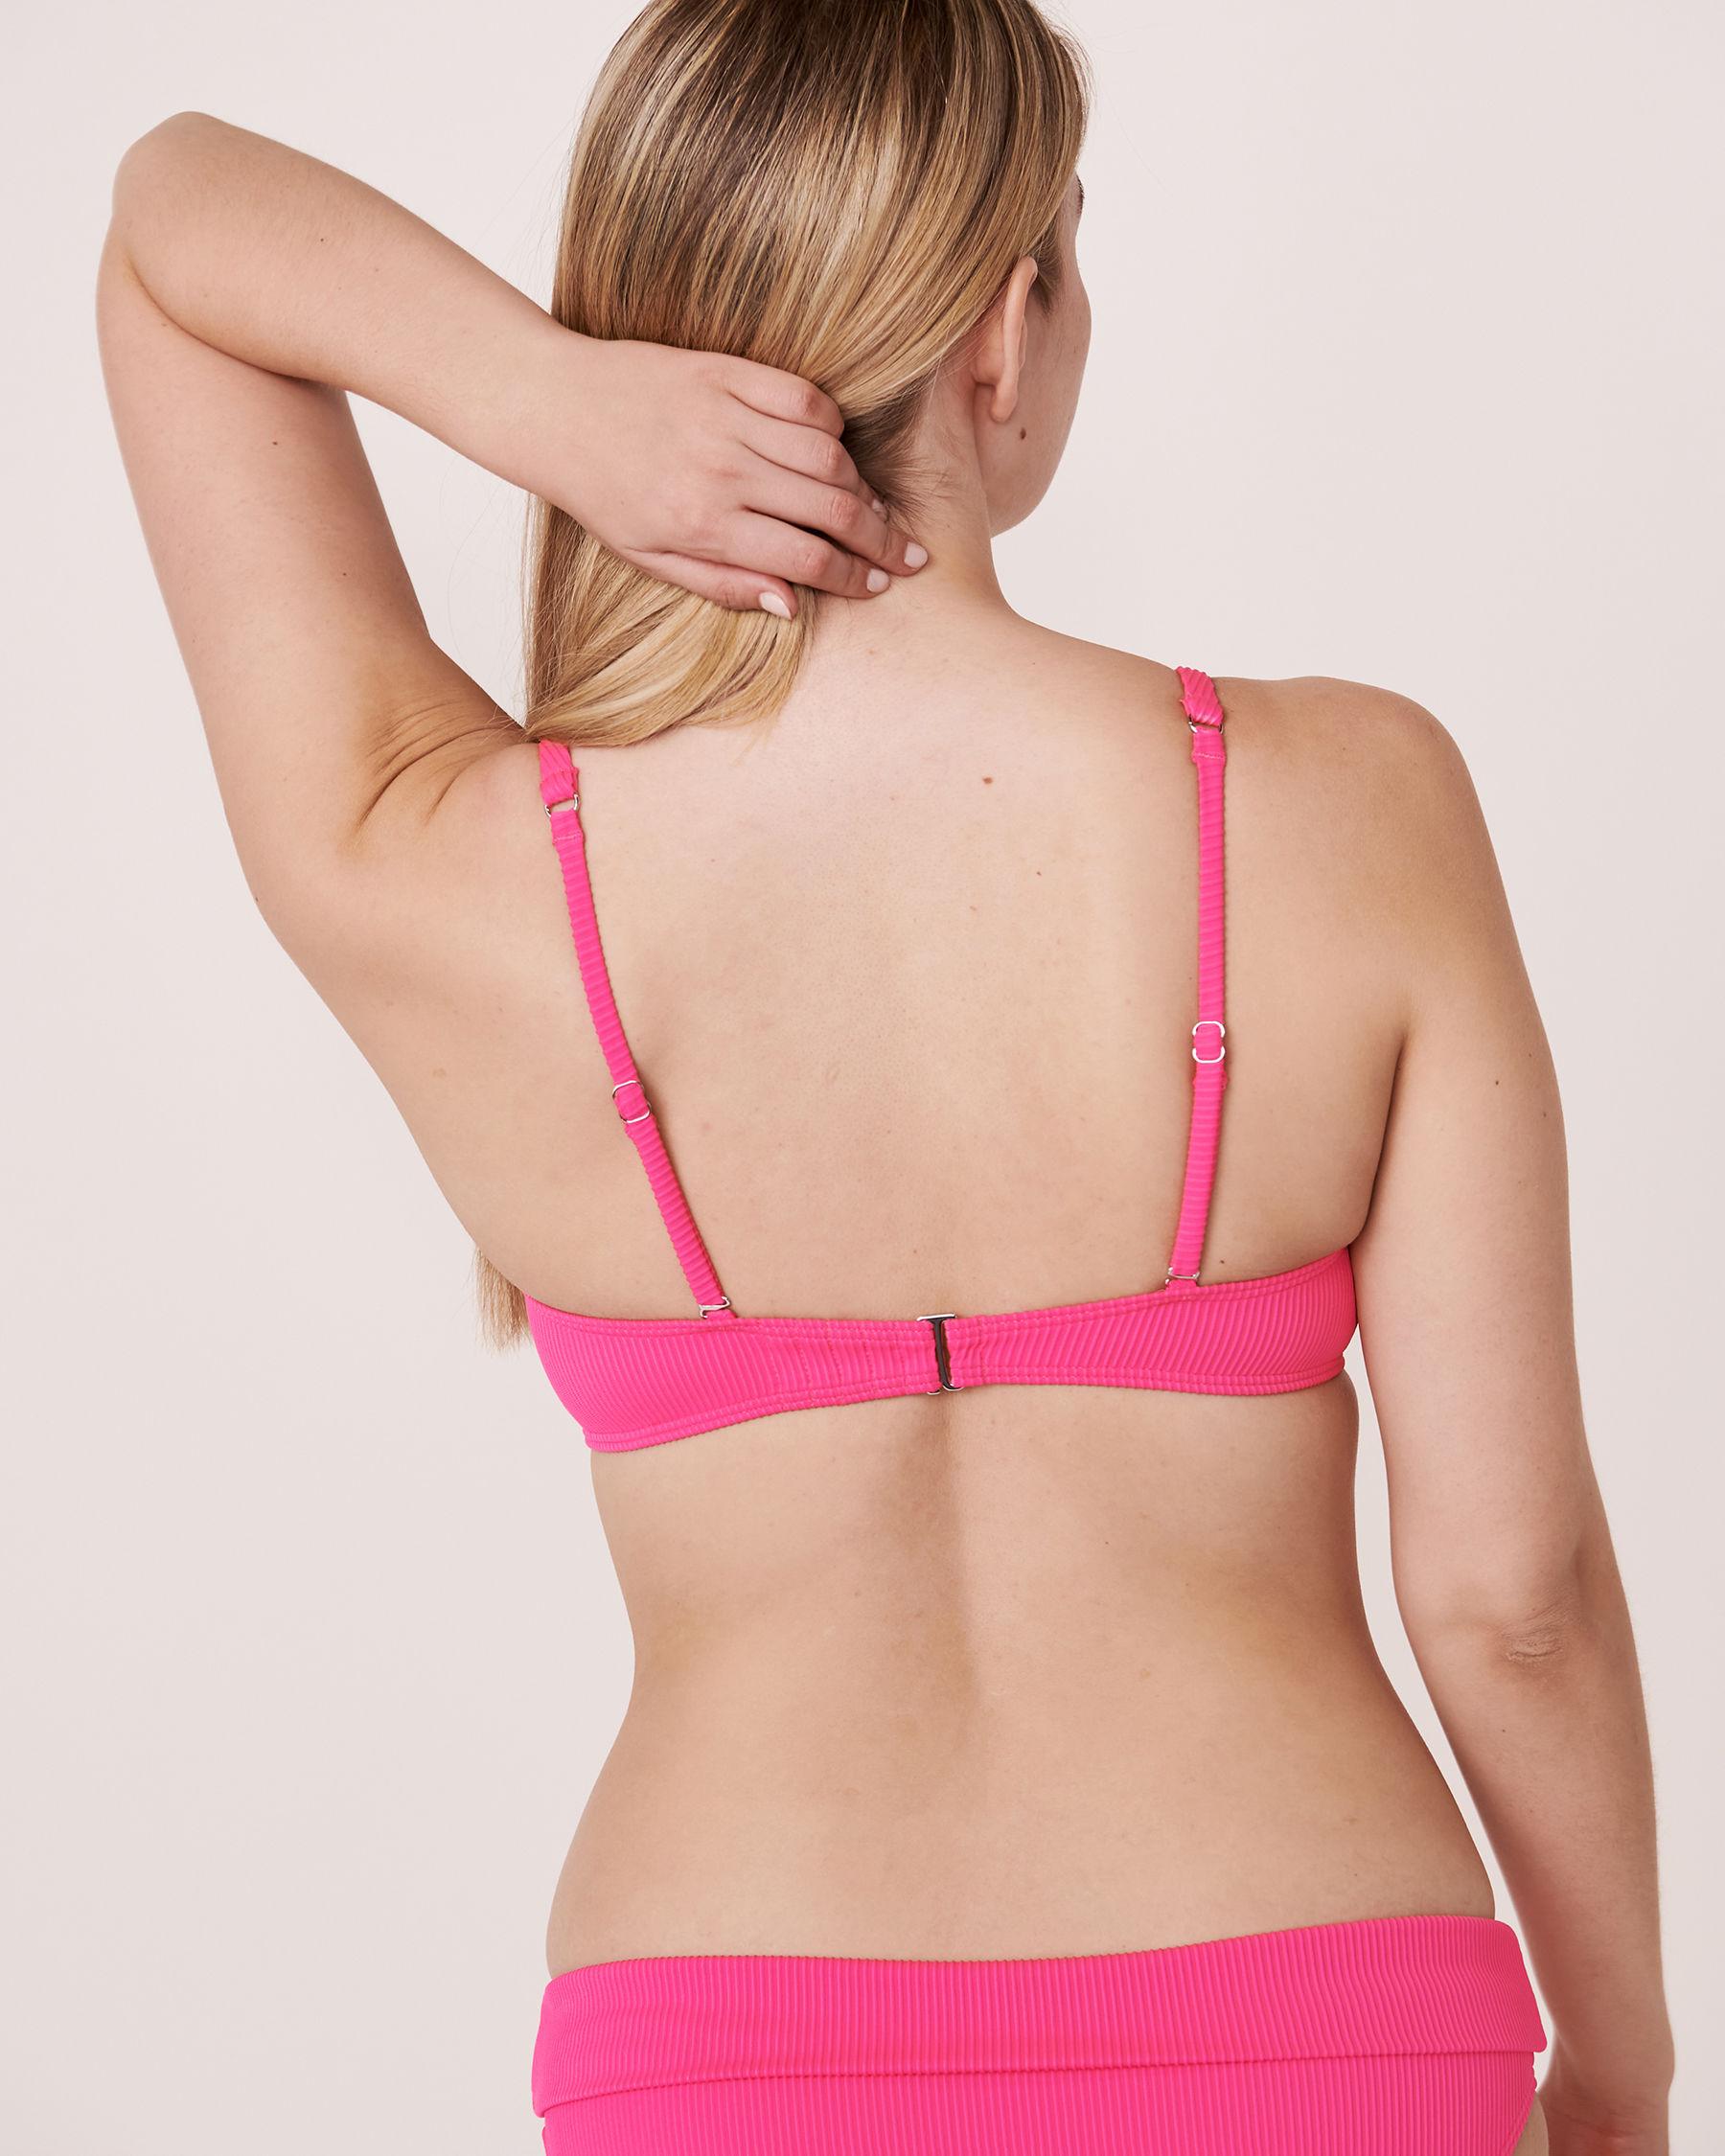 LA VIE EN ROSE AQUA Haut de bikini push-up en fibres recyclées TOOTSIE RIB Rose néon 70100072 - Voir3